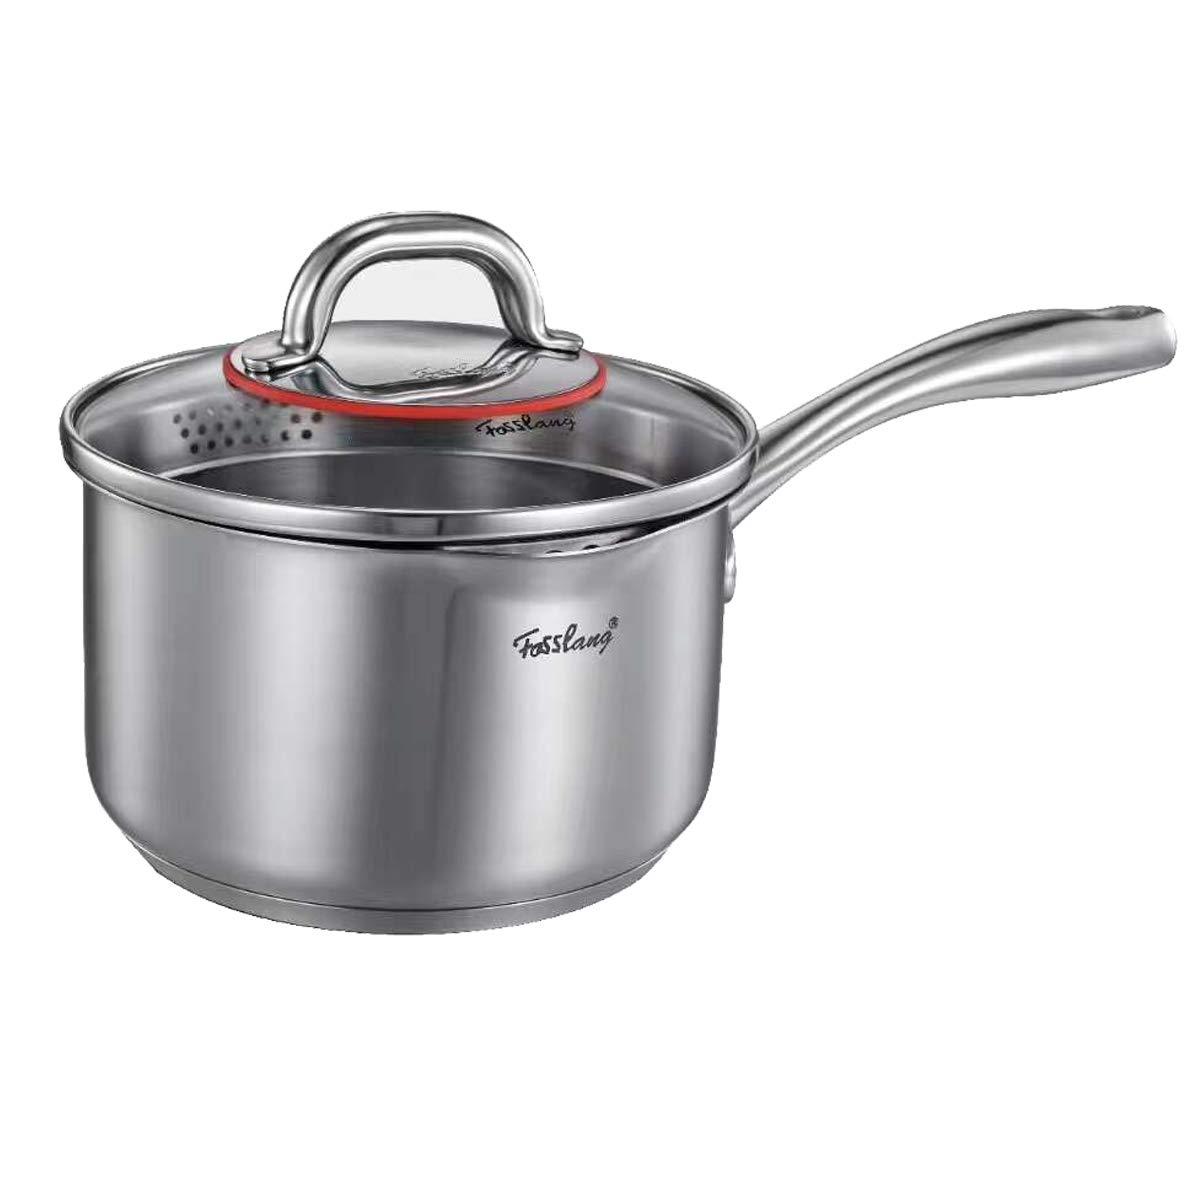 Stainless Steel Saucepan, Fosslang Milk Pot with Glass Lid, Induction Hob Milk Pan - 16cm/1.5L